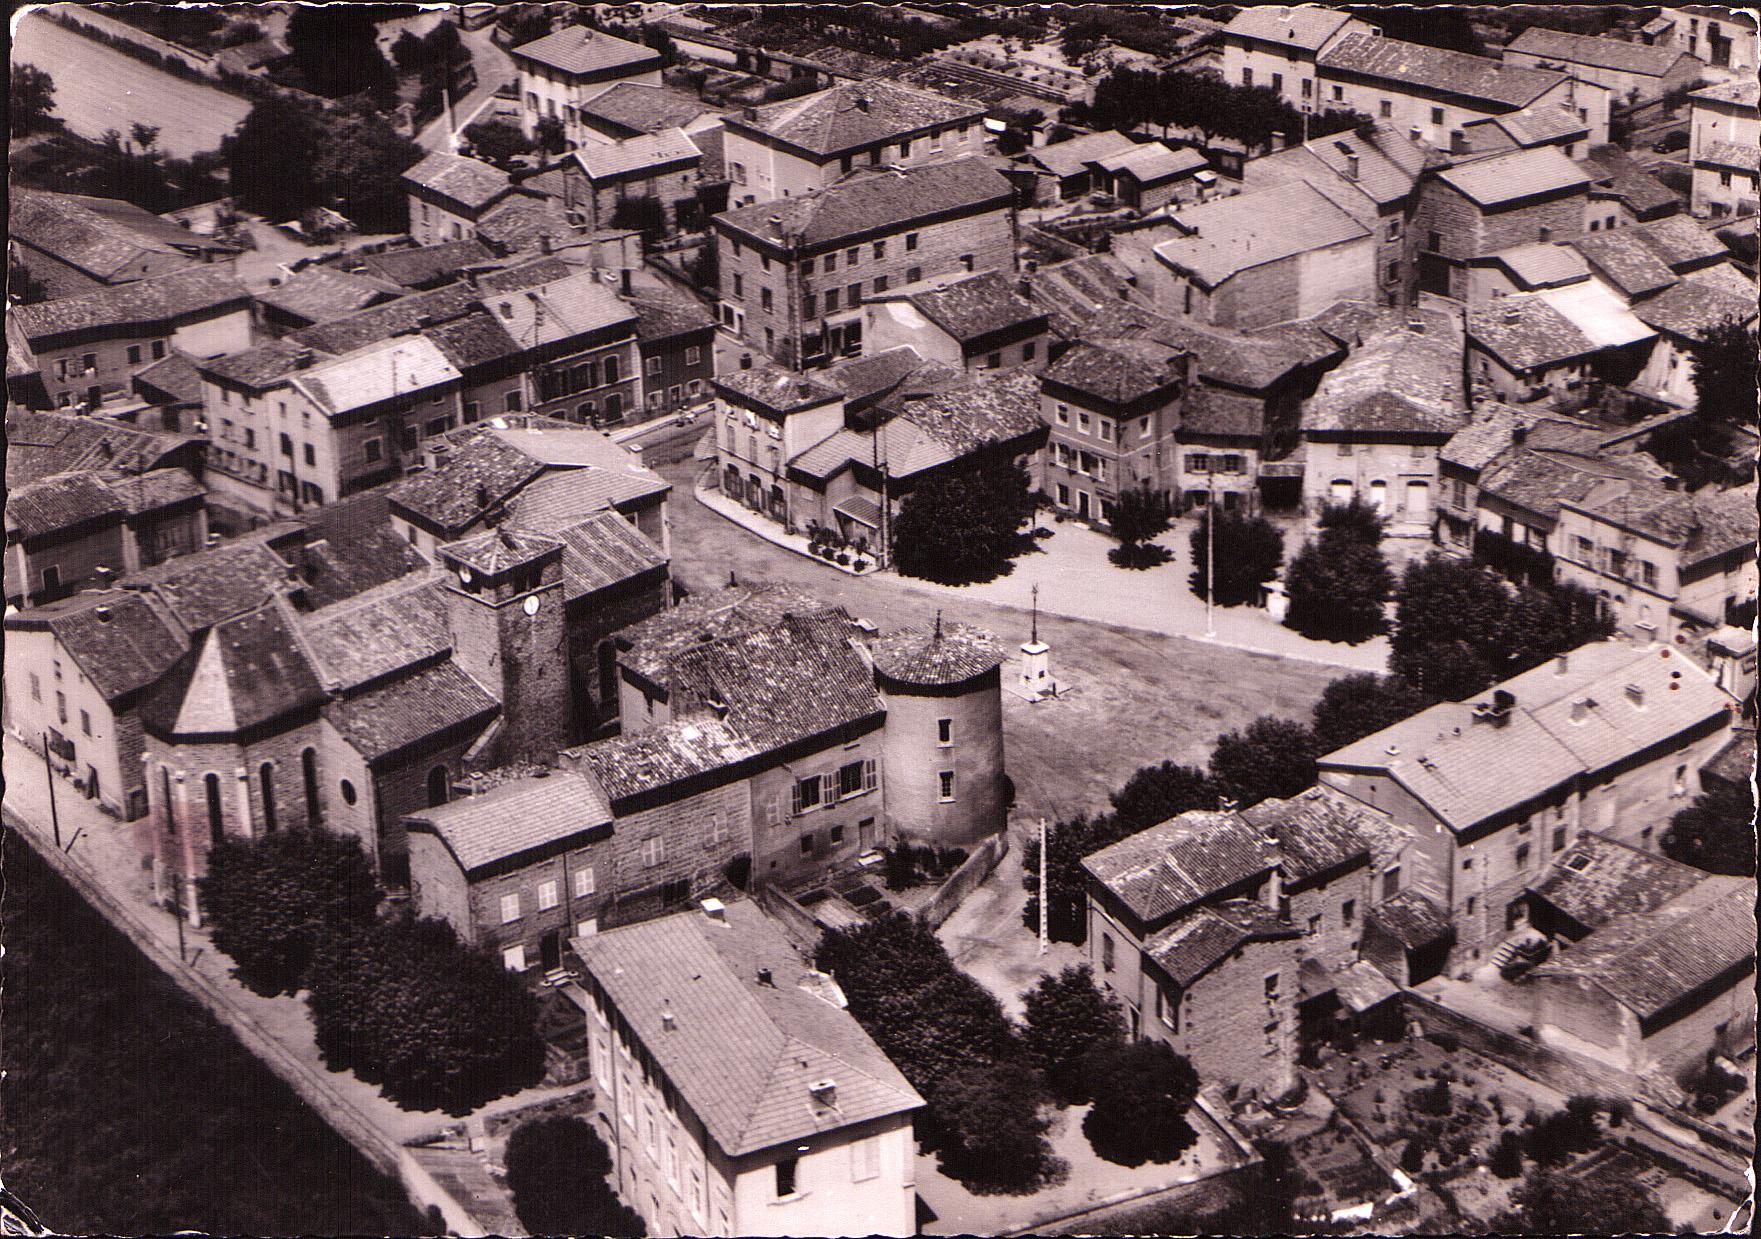 Brindas - Vue aérienne du bourg vers 1945-1950 environ